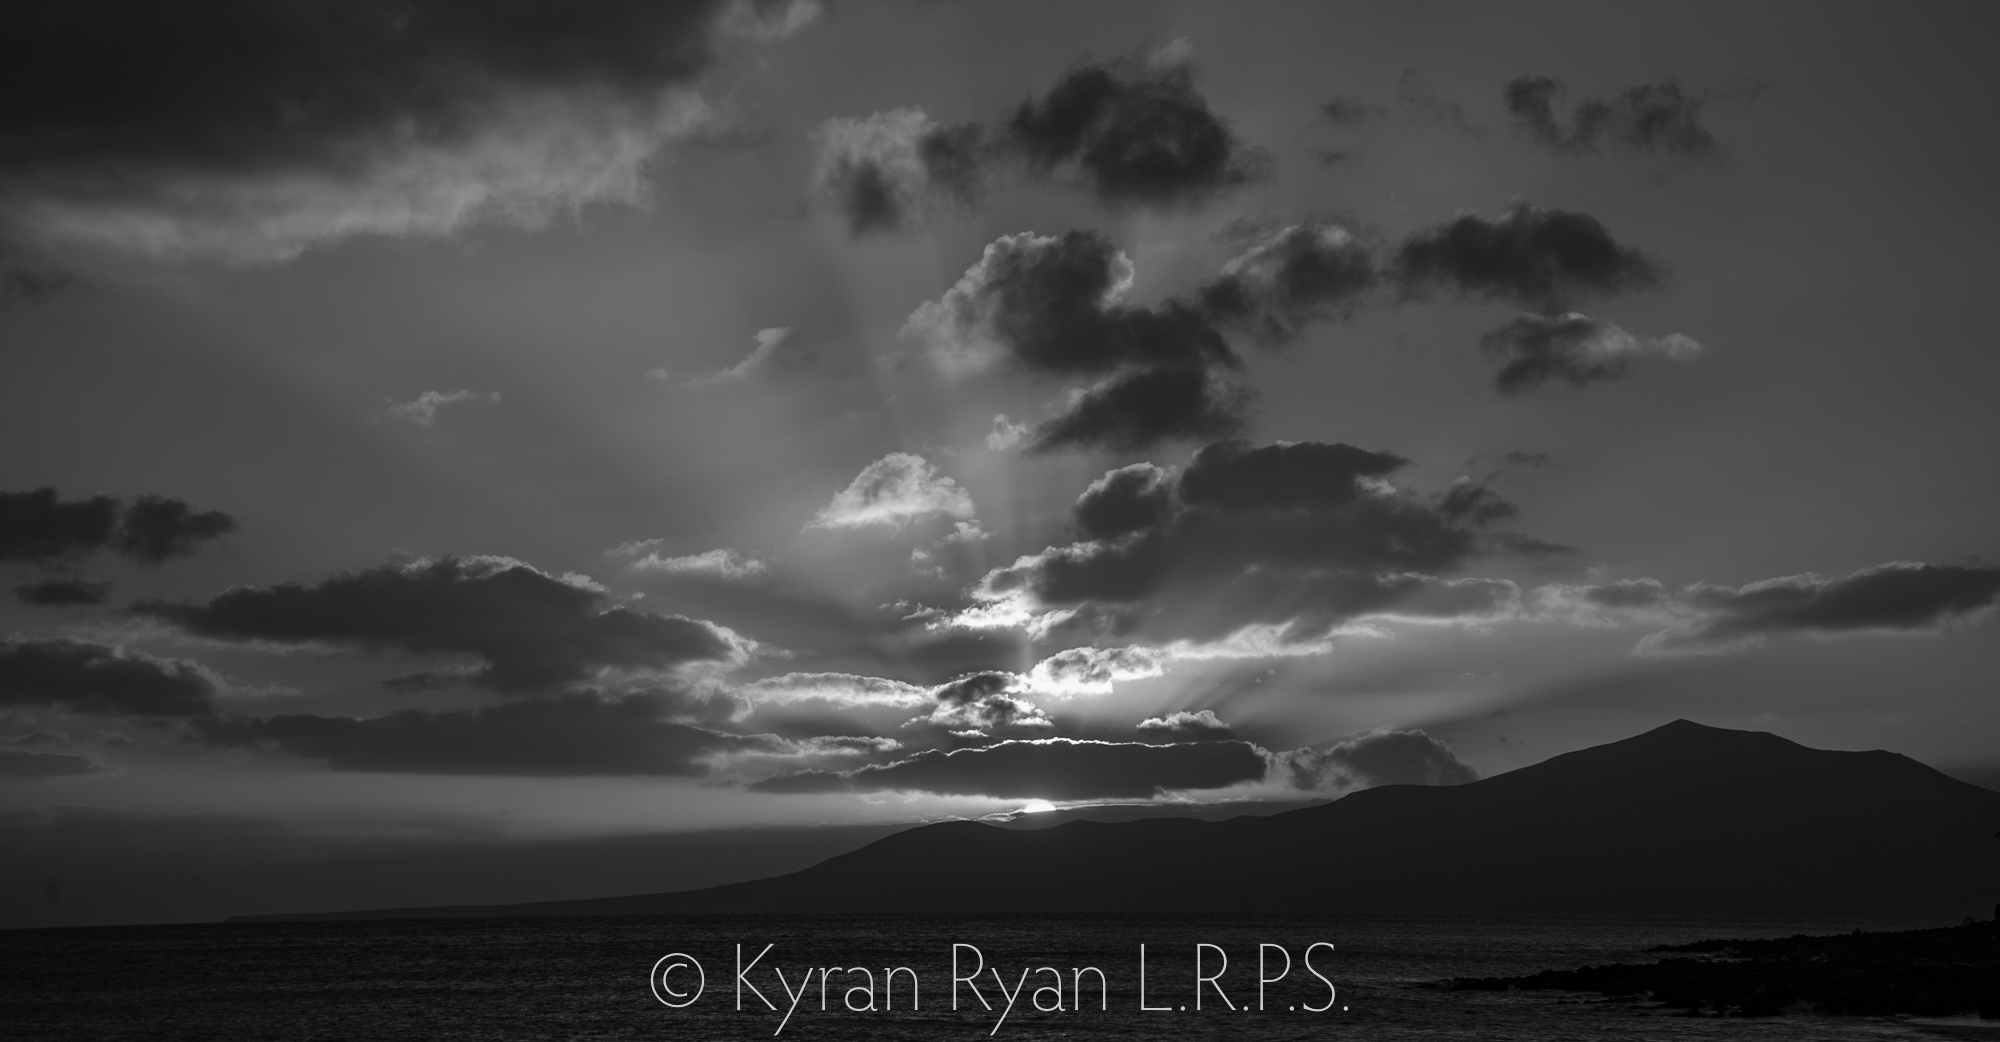 Kyran Ryan